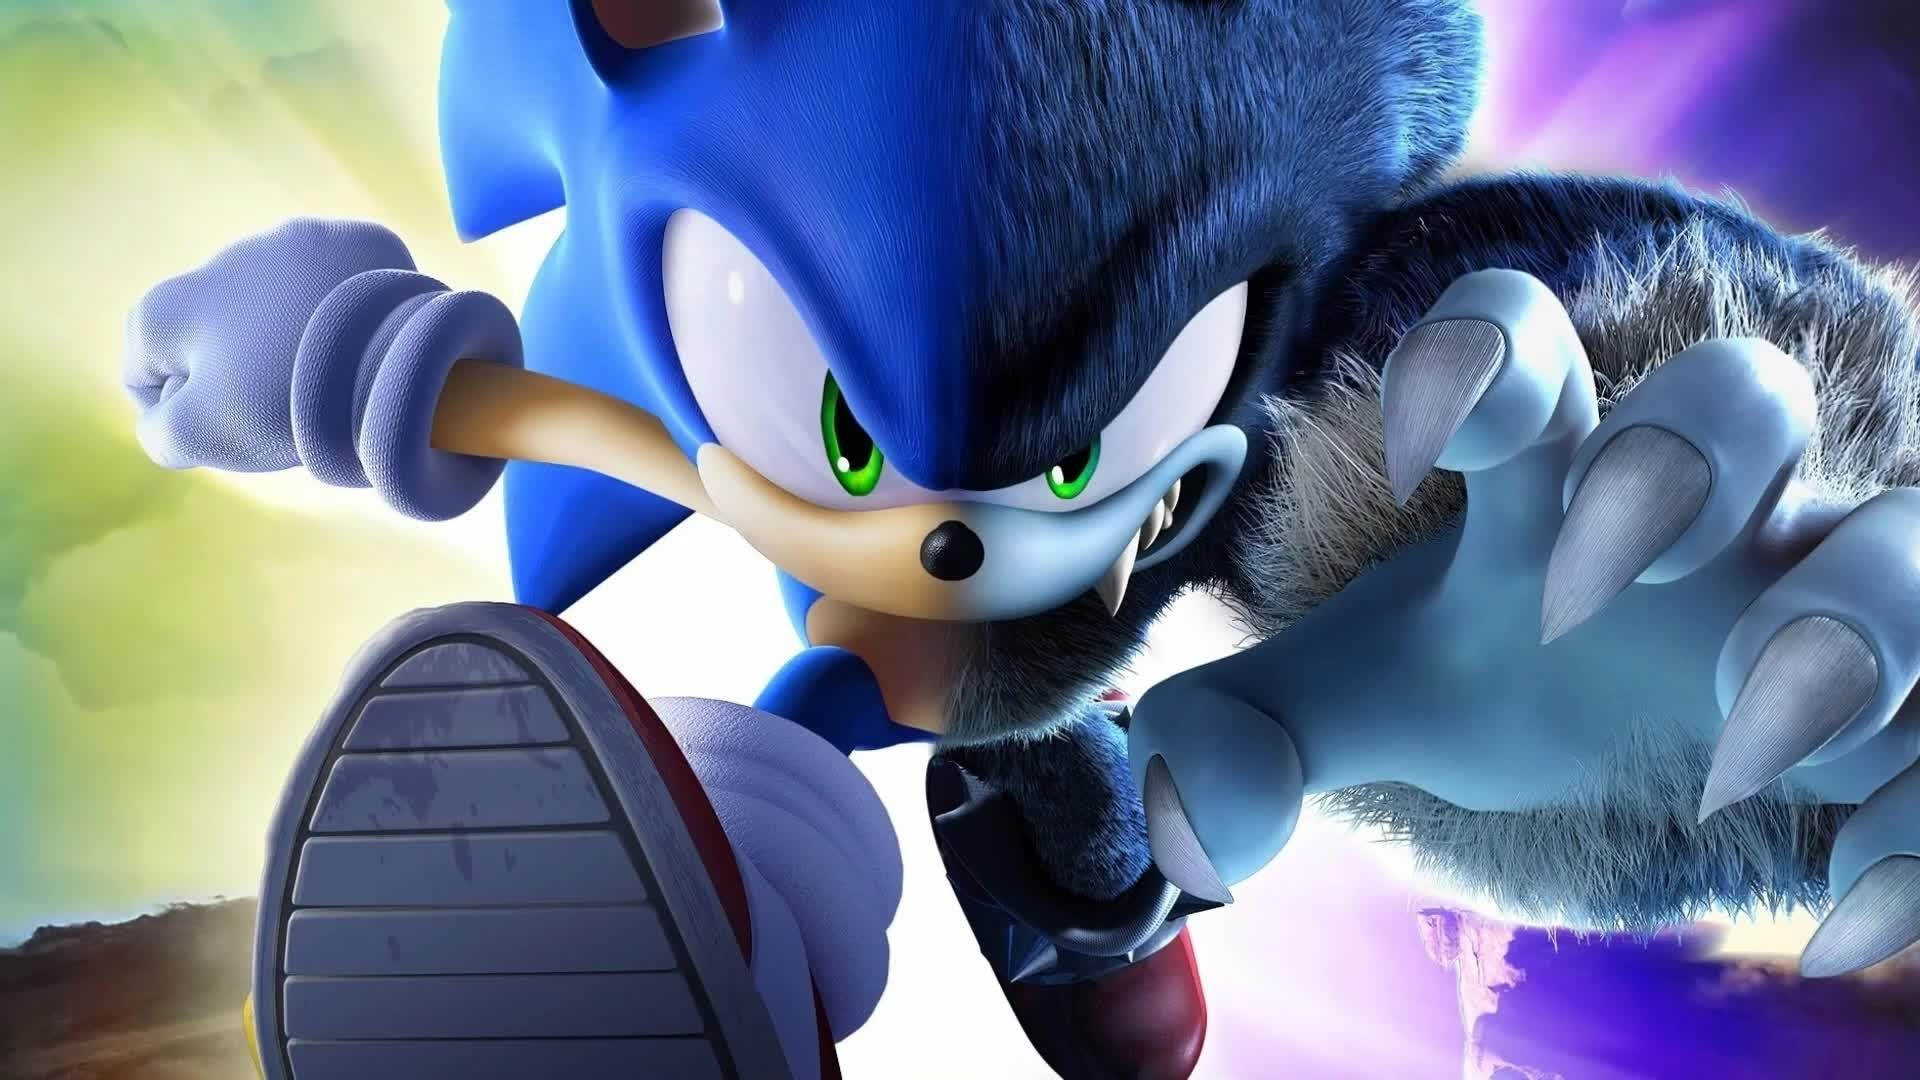 Sonic The Hedgehog Live Wallpaper Desktophut inside Sonic